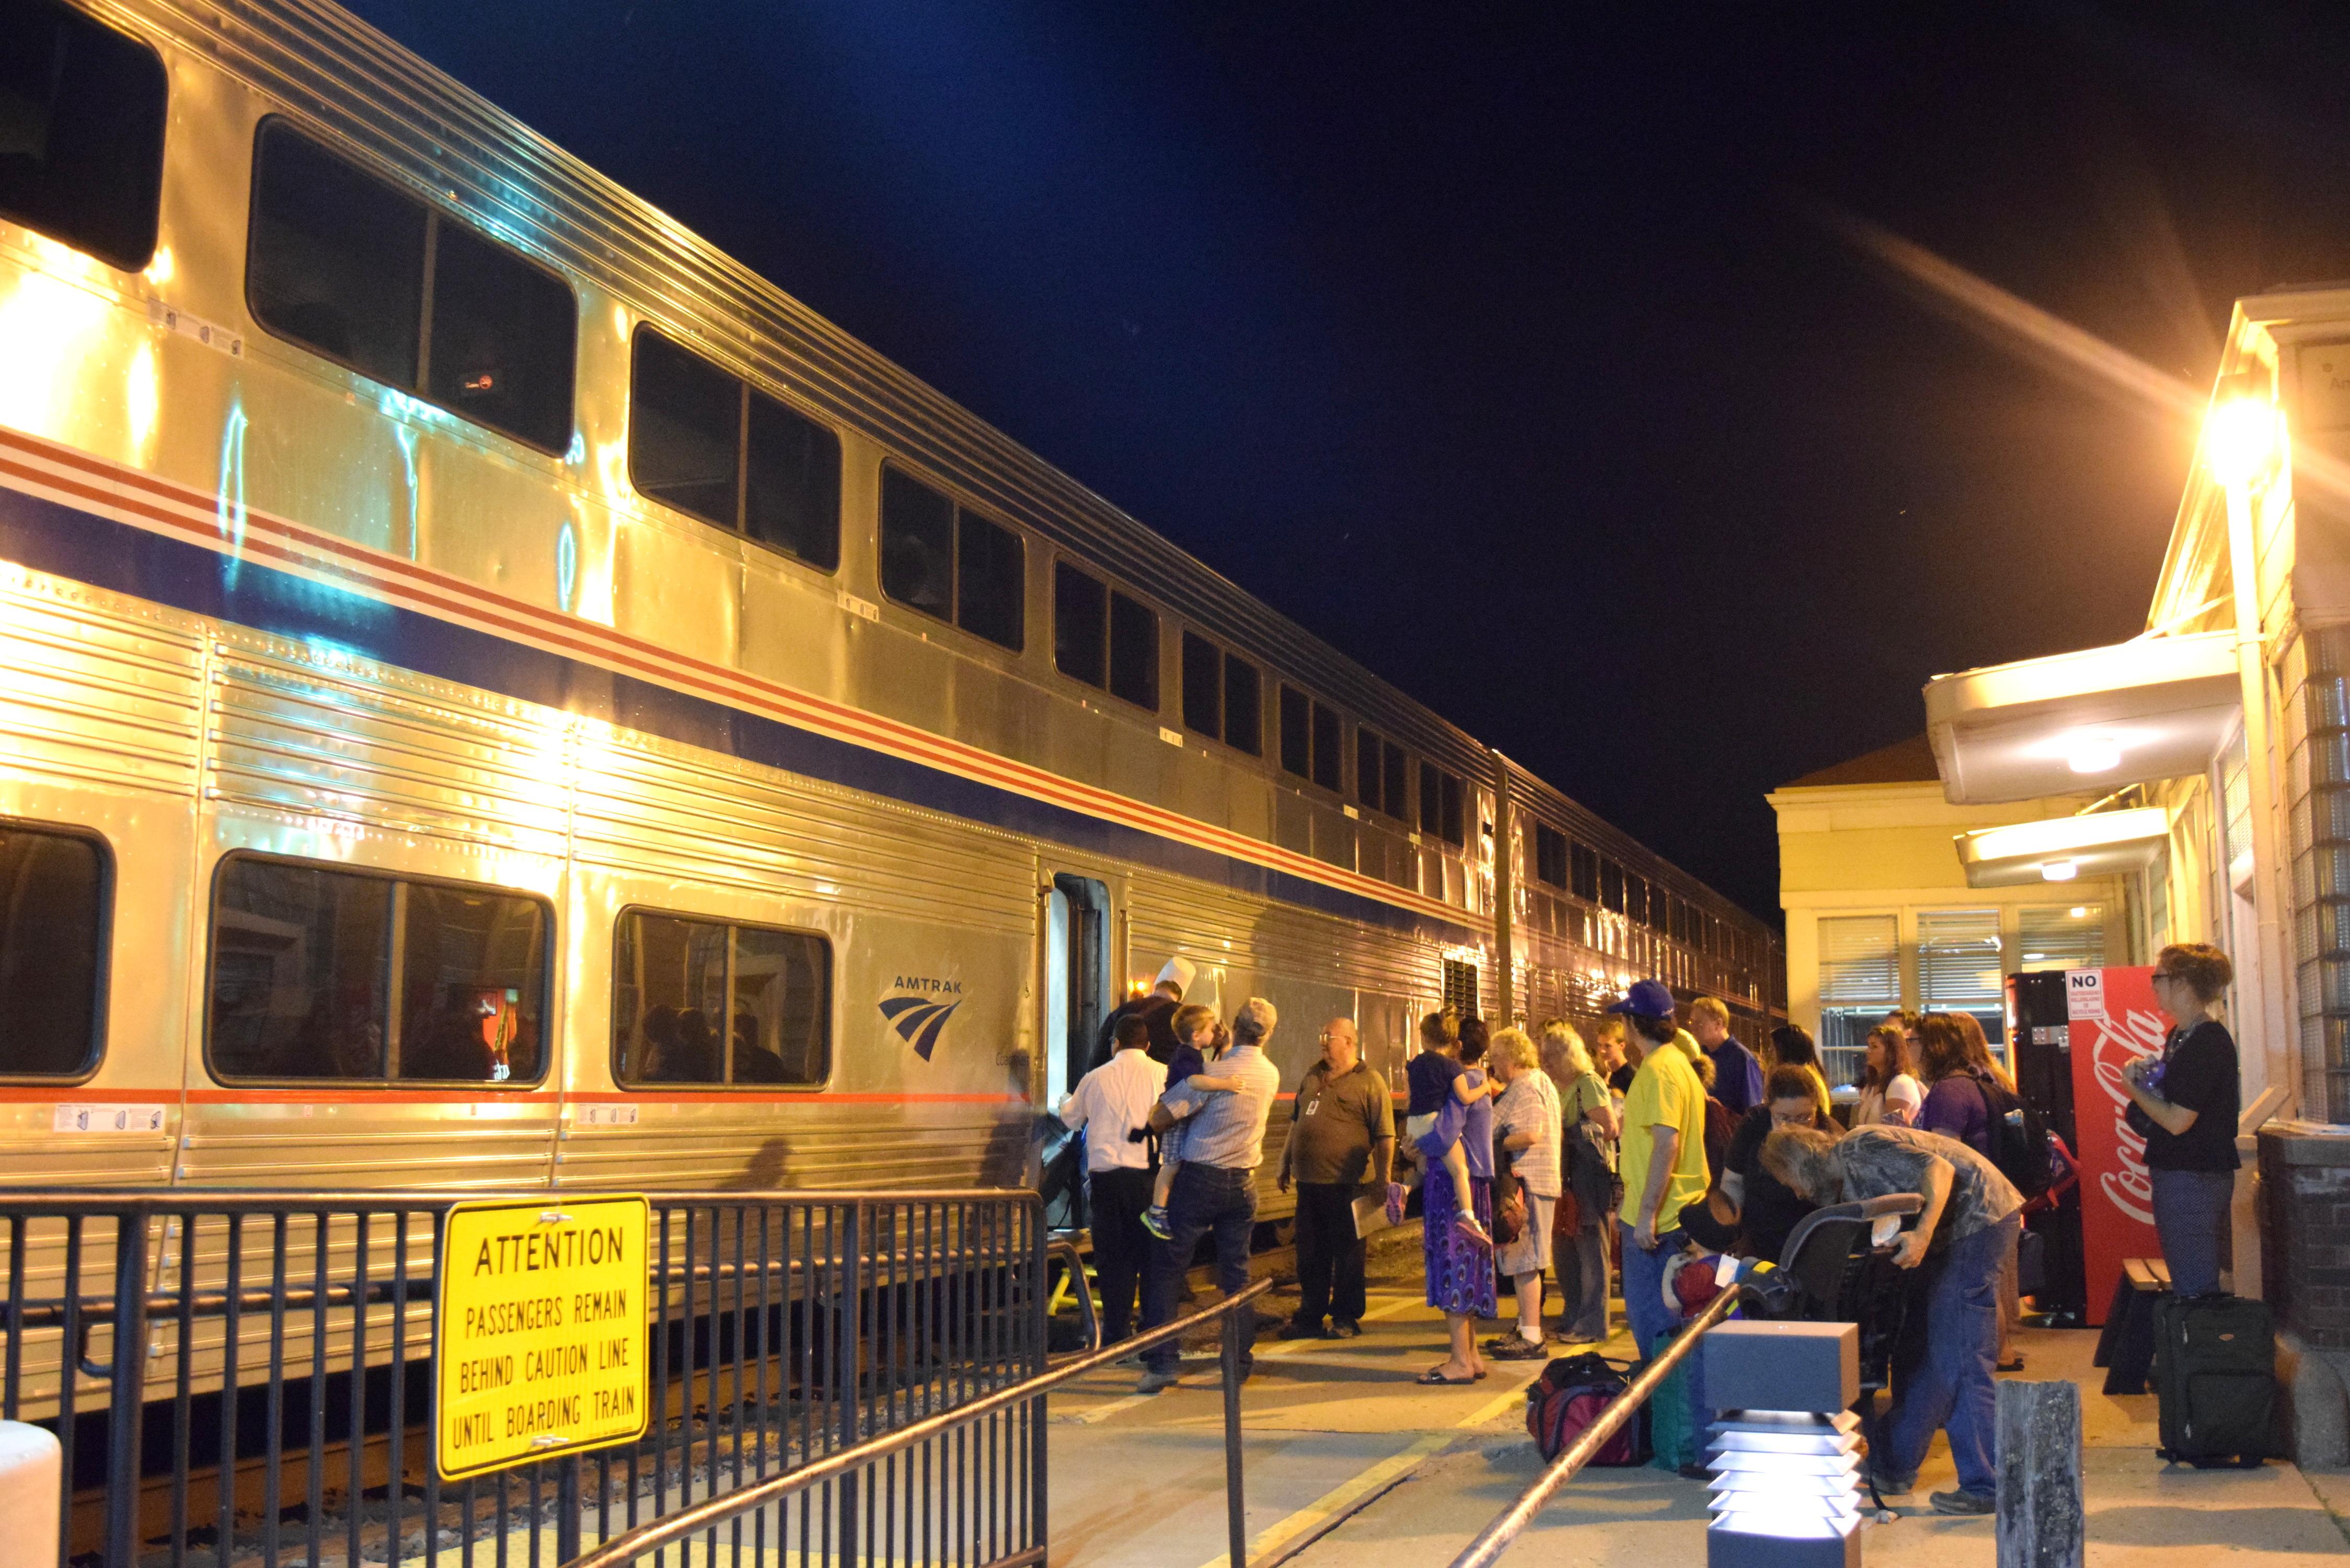 Estação de La Plata.